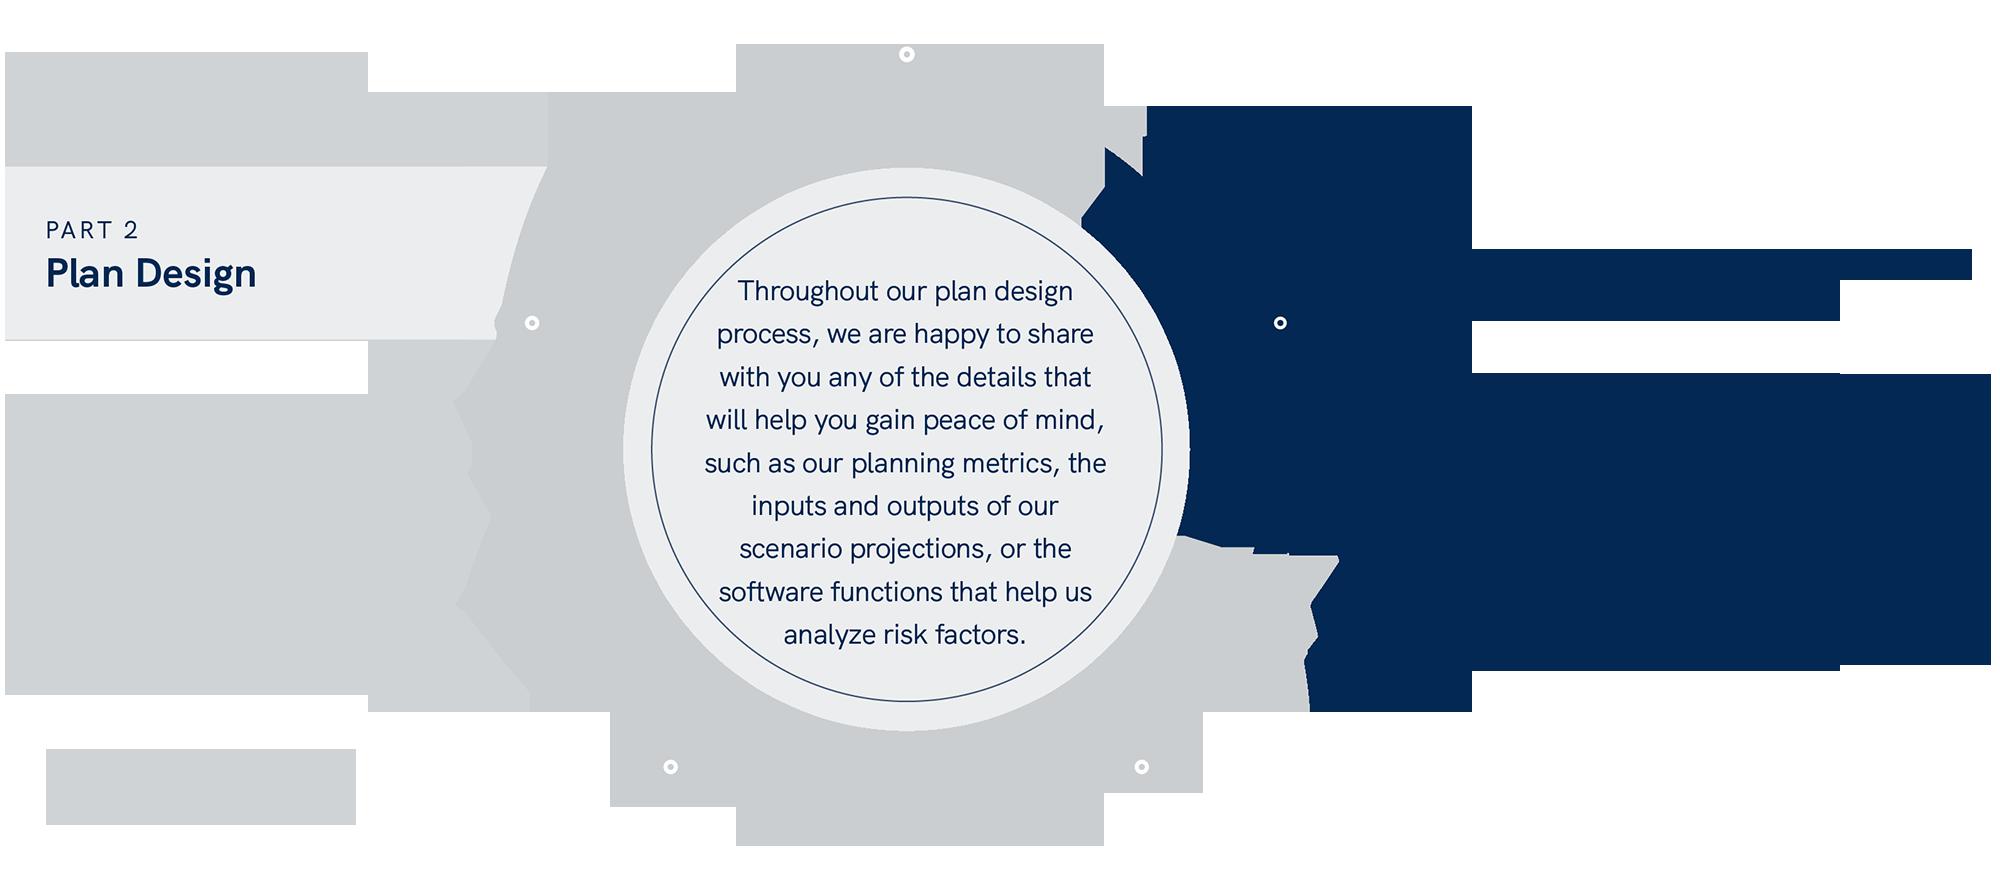 Part 2 - Plan Design